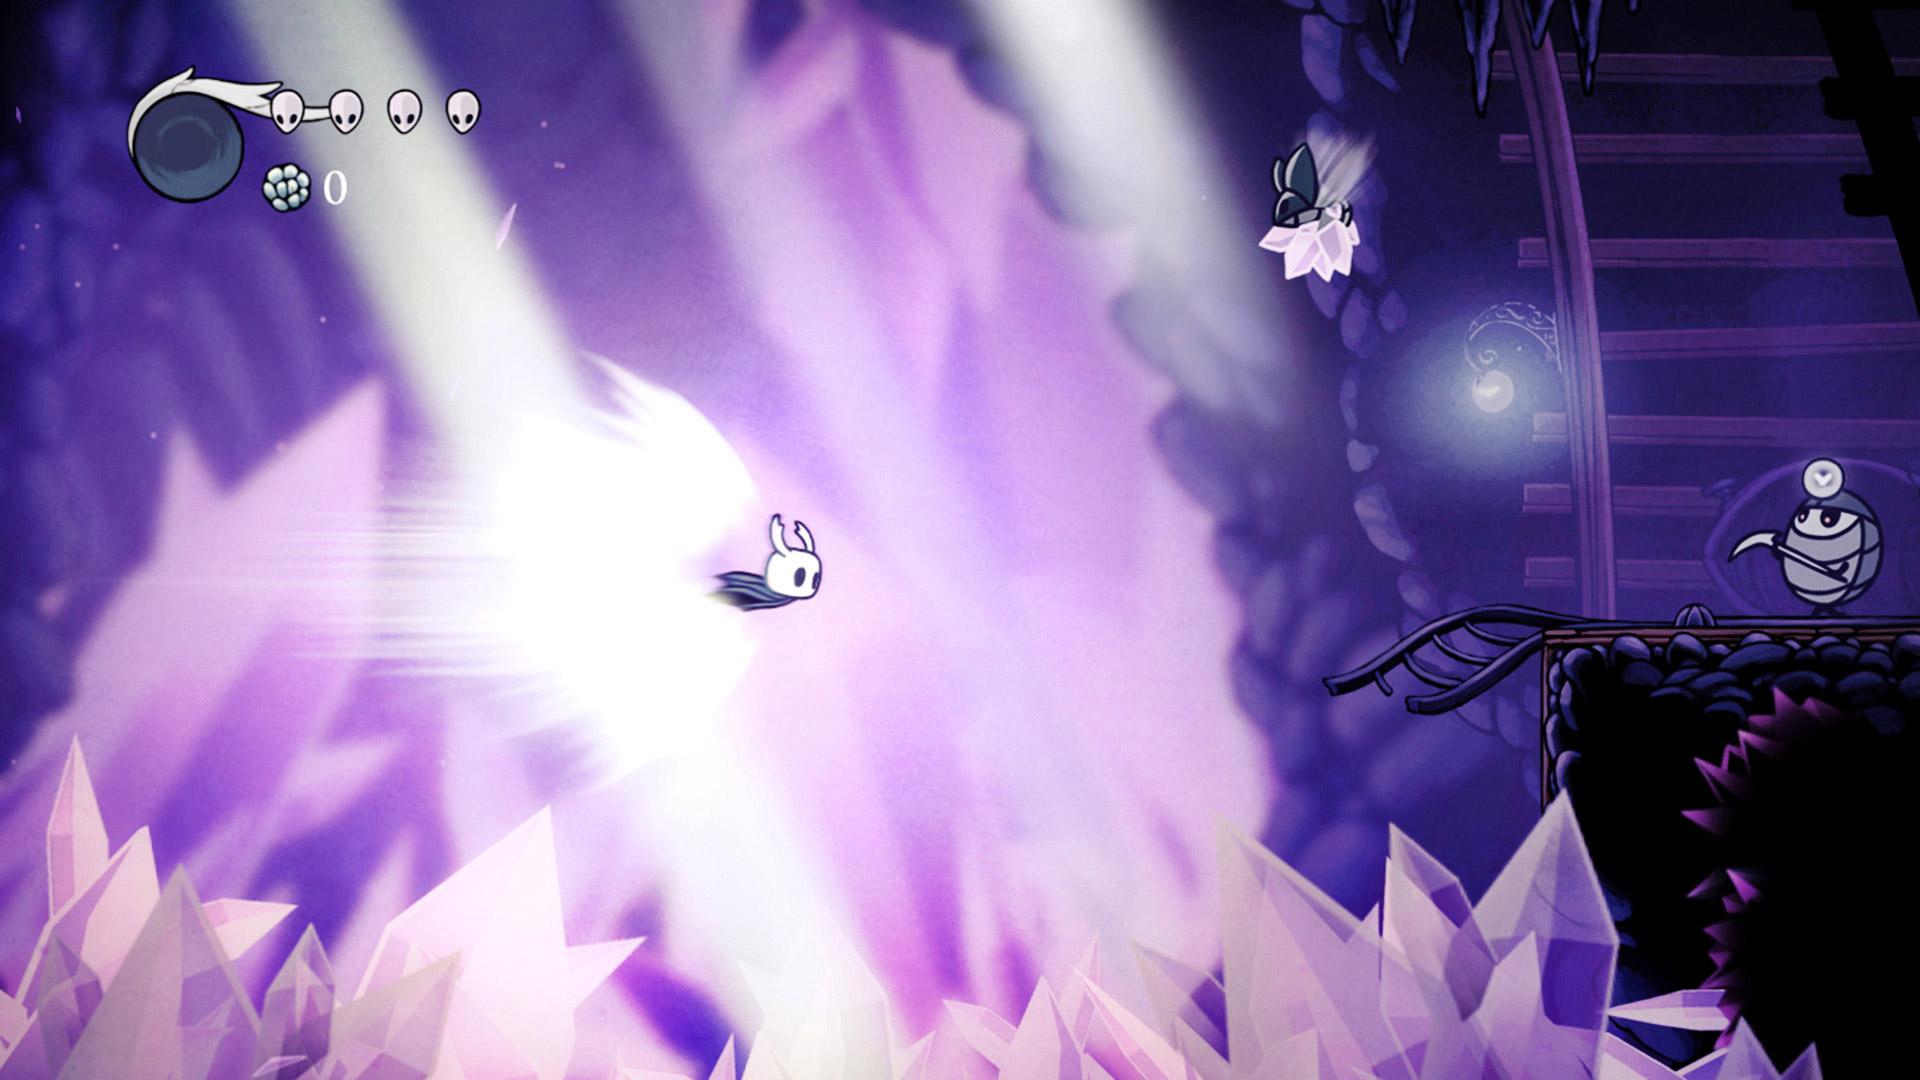 Скриншот №4 к Hollow Knight Издание «Сердце пустоты»